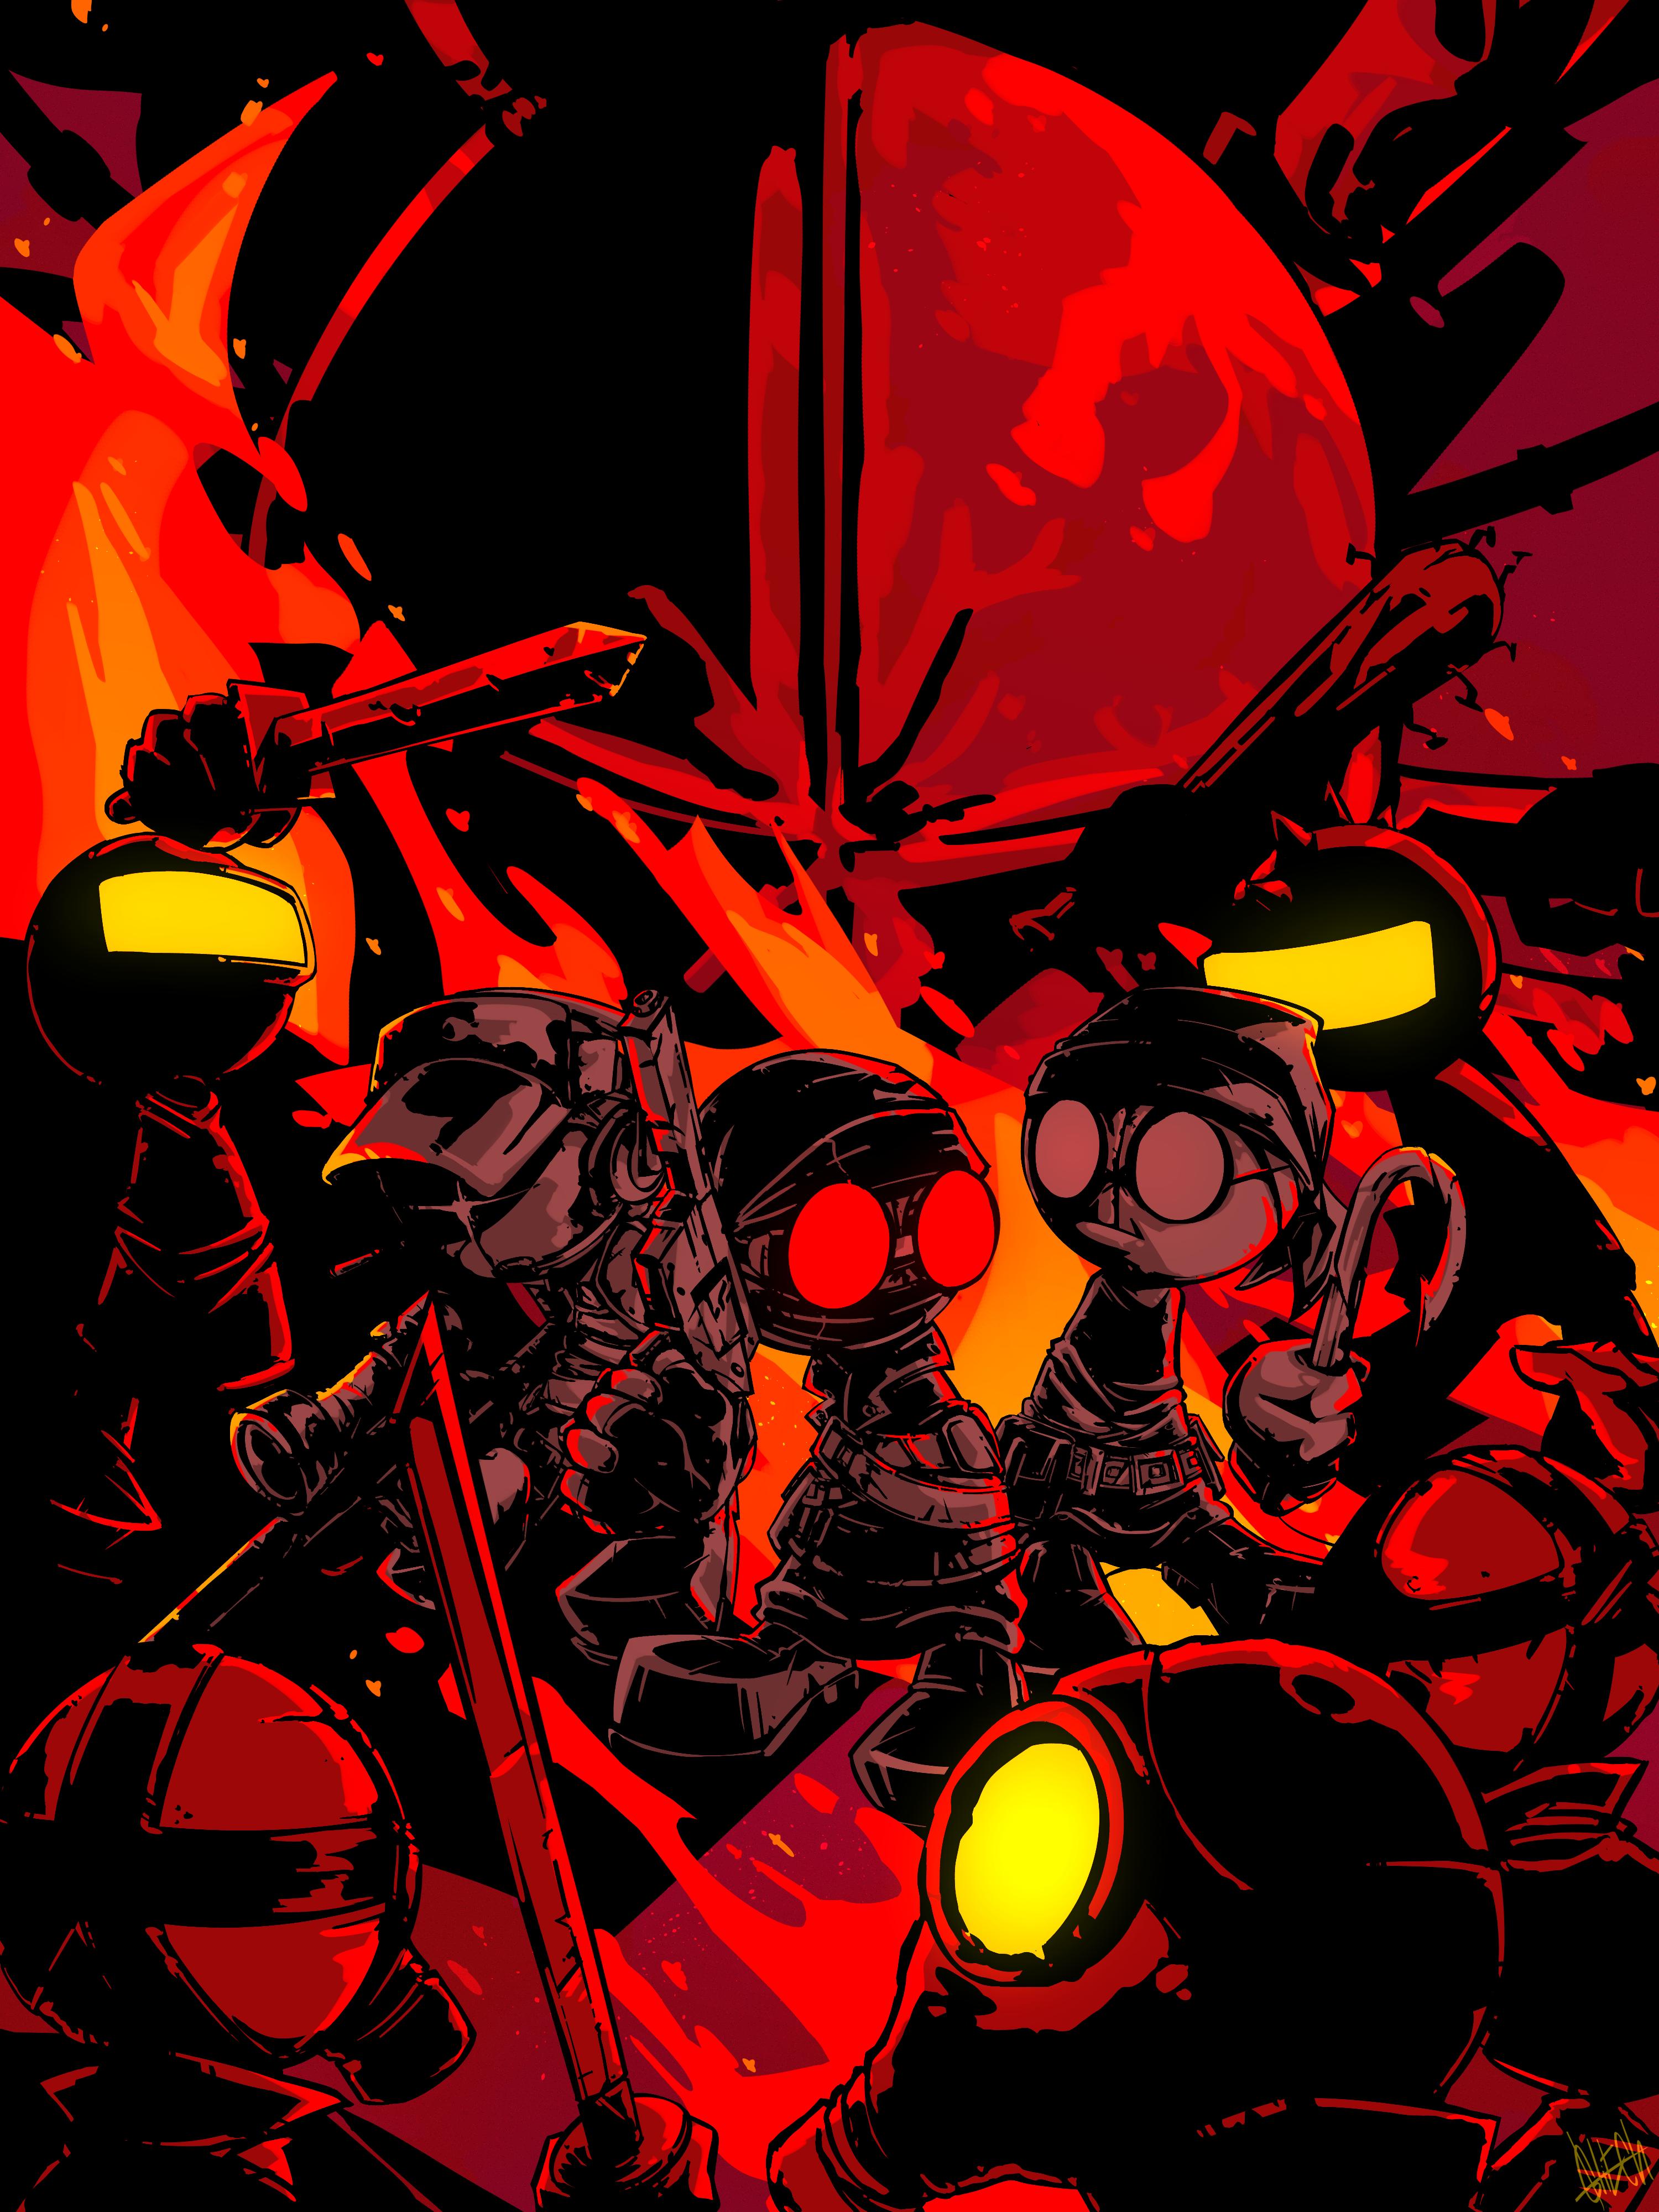 Madness: Project Nexus (Grunt version)